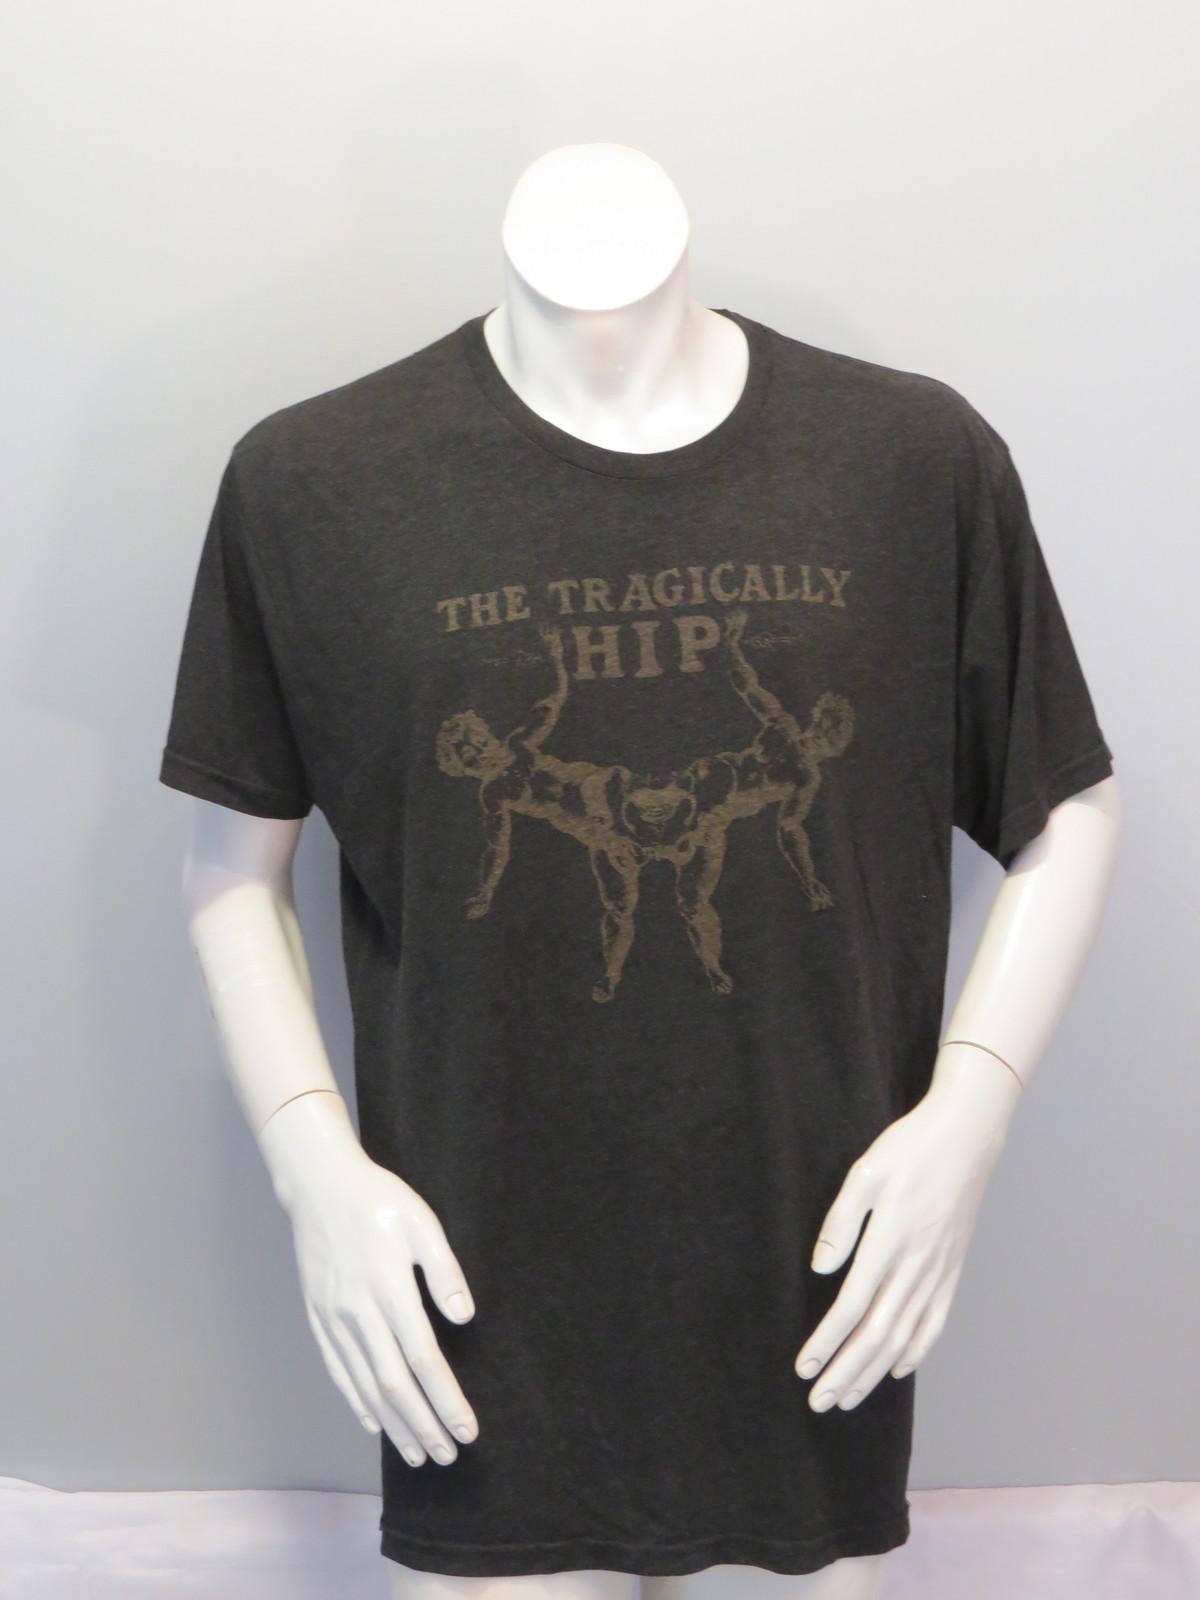 Vintage Tragically Hip Shirt - 1990s Record Store Promo - Men's XL